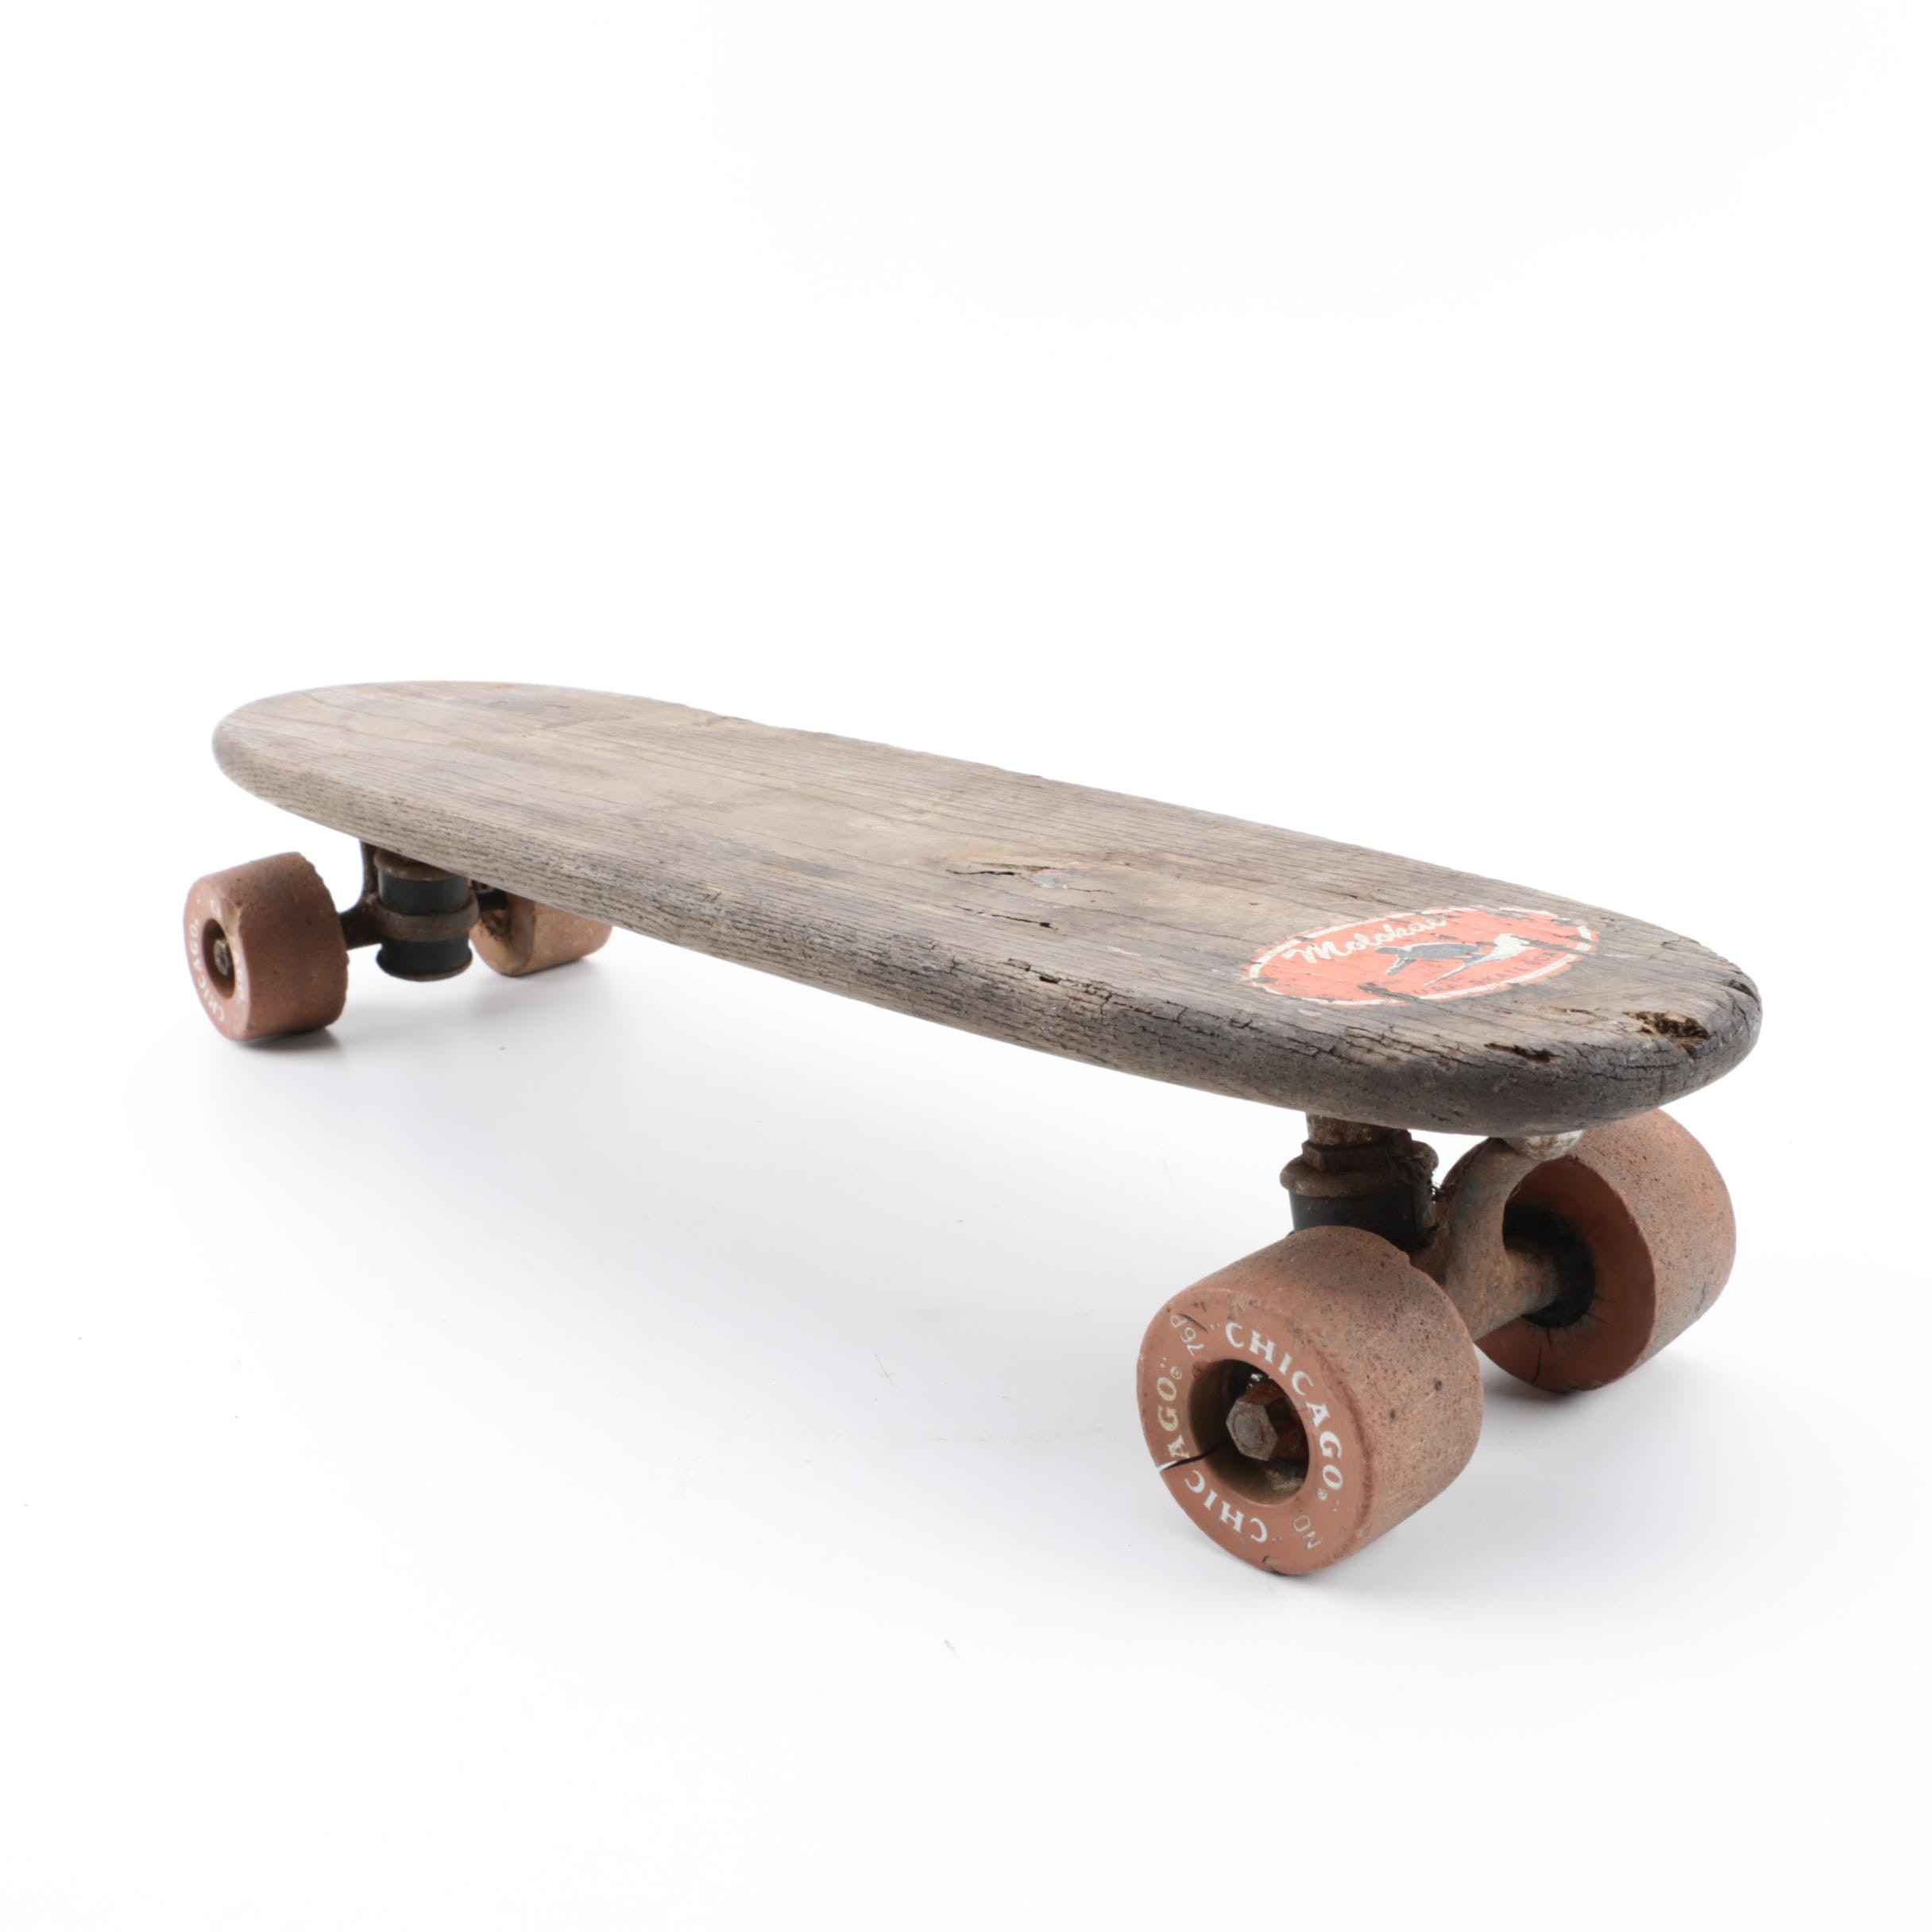 1960s Molokai Surf Skateboard with Clay Wheels